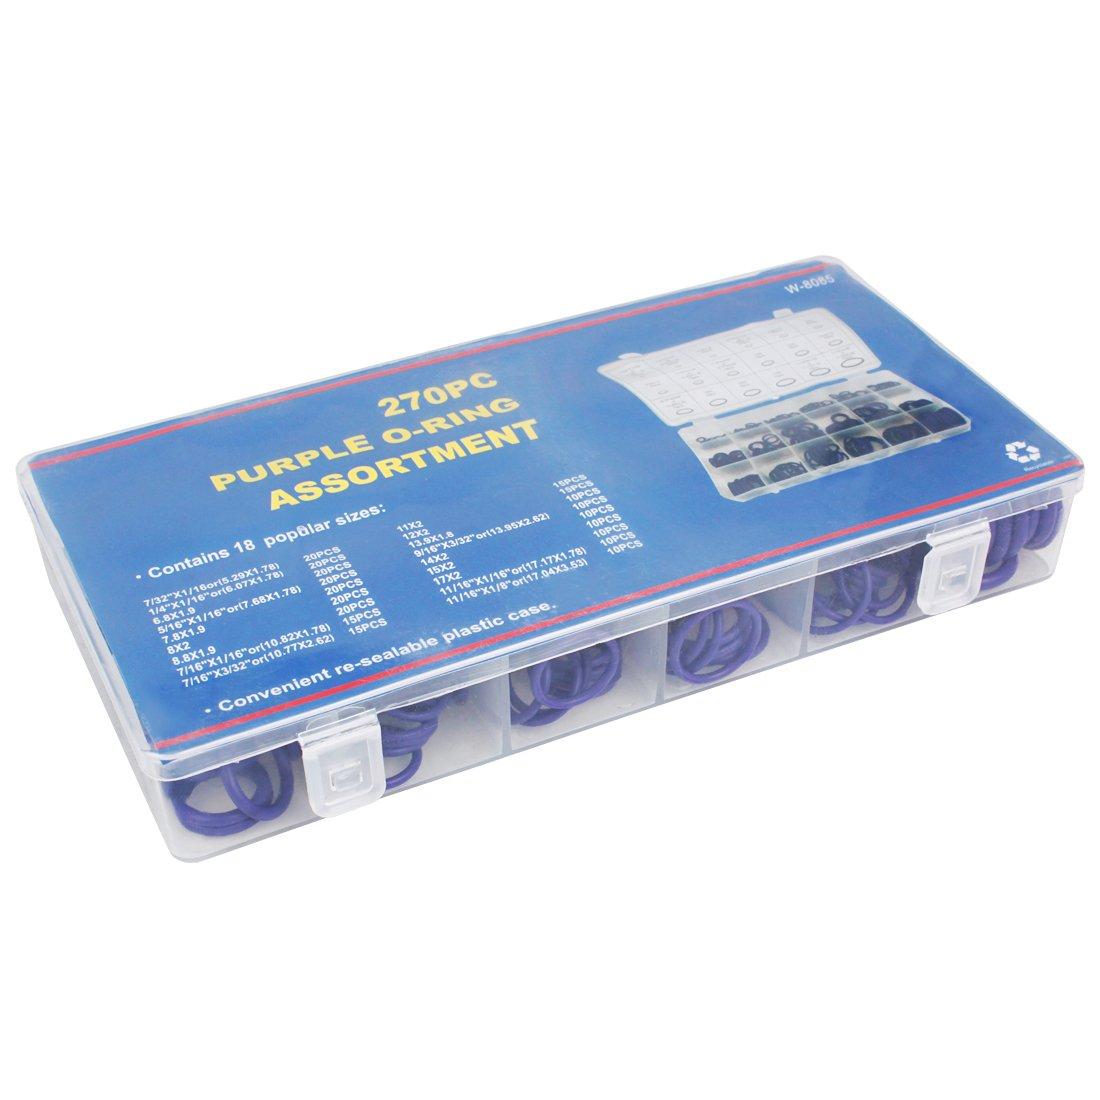 Gr/ün Larcele 18 Gr/ö/ßen Gummi-O-Ring-Sortiment kit Dichtungen f/ür Kfz-Klimaanlagen-Kompressor,270 St/ück QC-MFX01